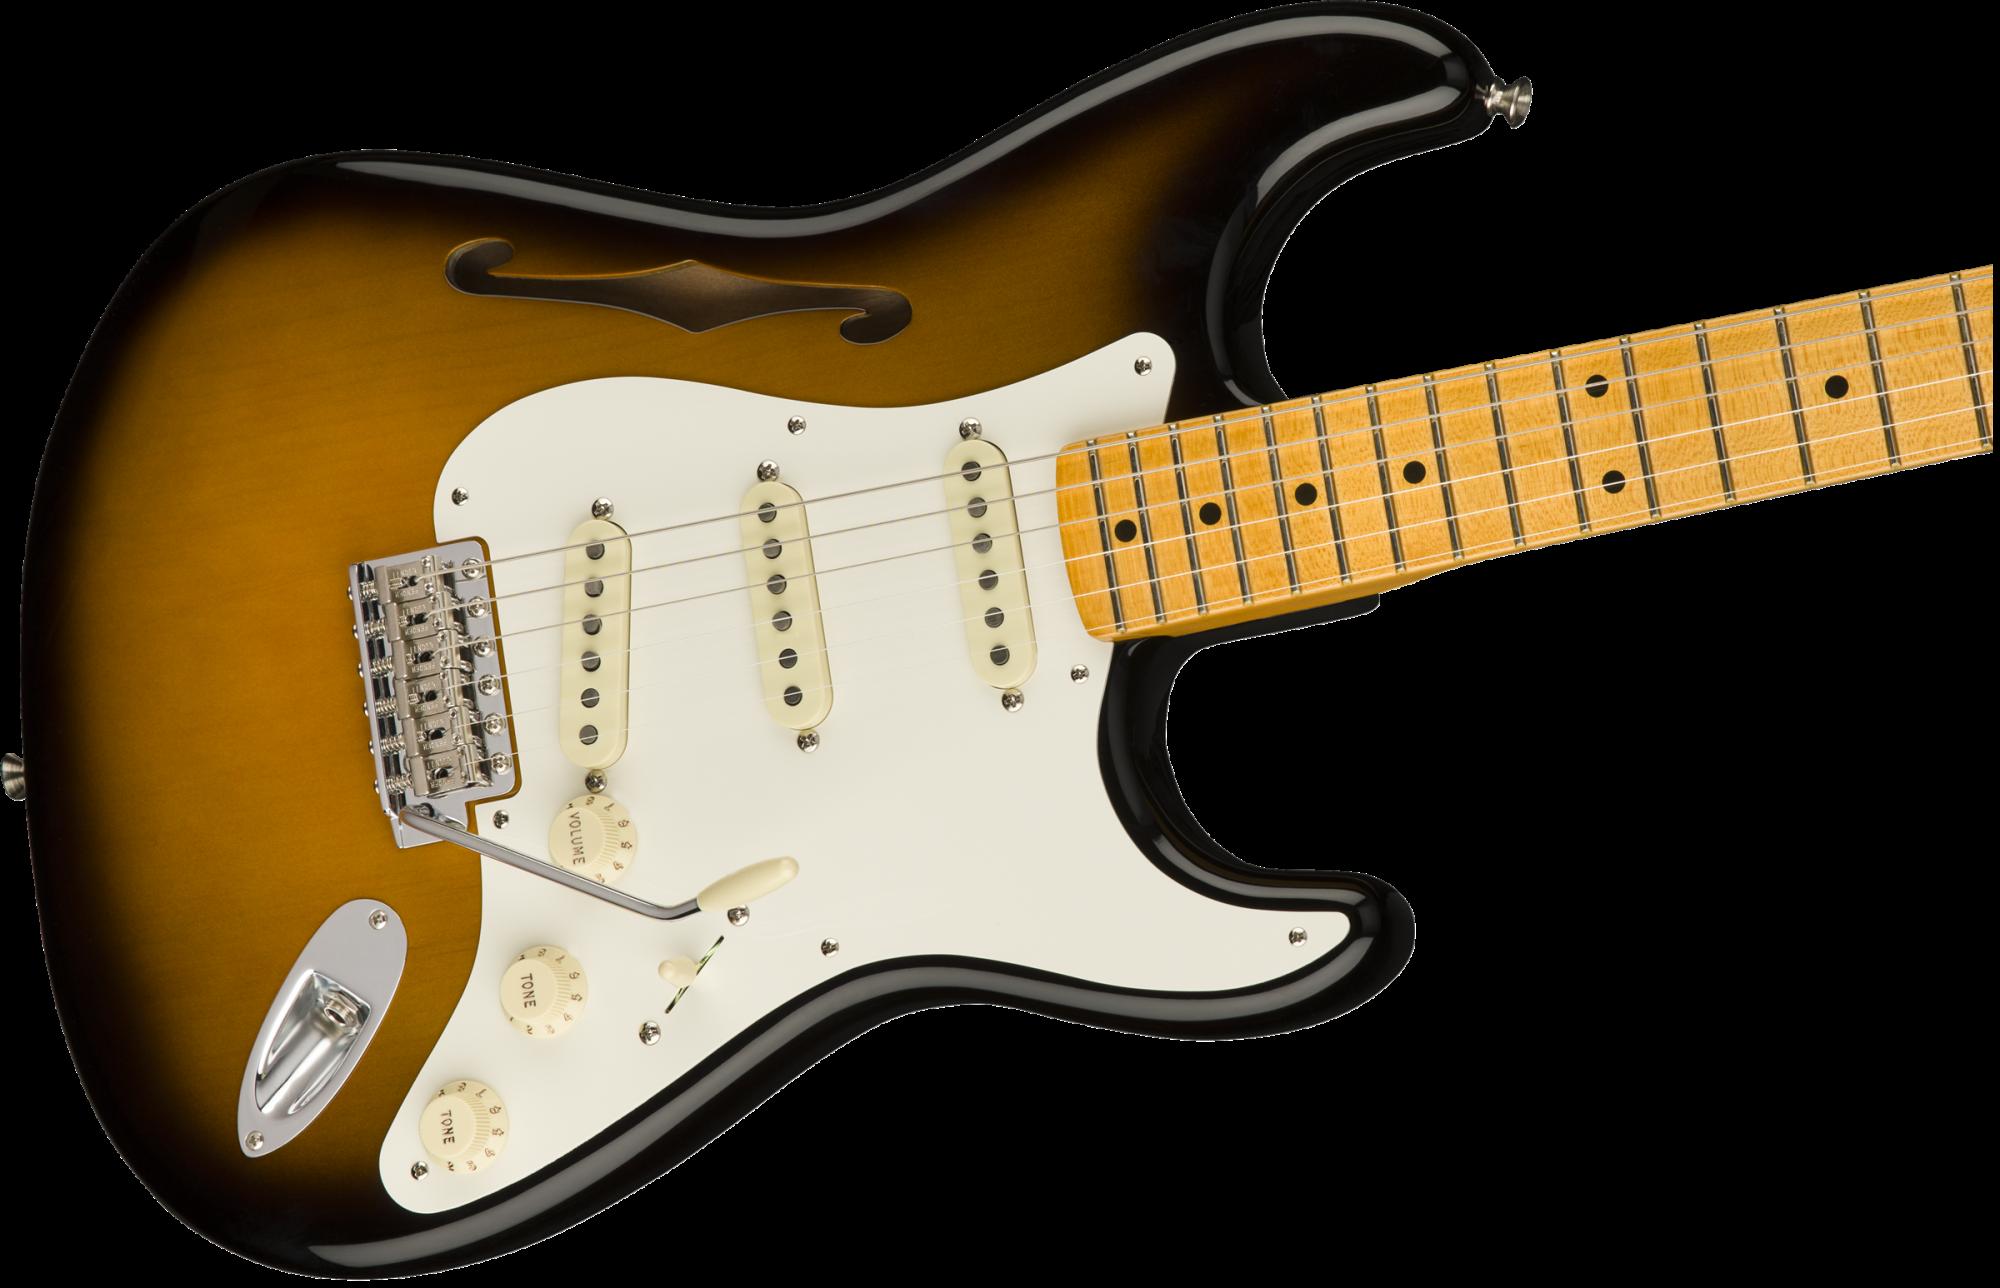 Fender Eric Johnson Thinline Stratocaster Electric Gutiar - Maple Fingerboard - 2-Color Sunburst